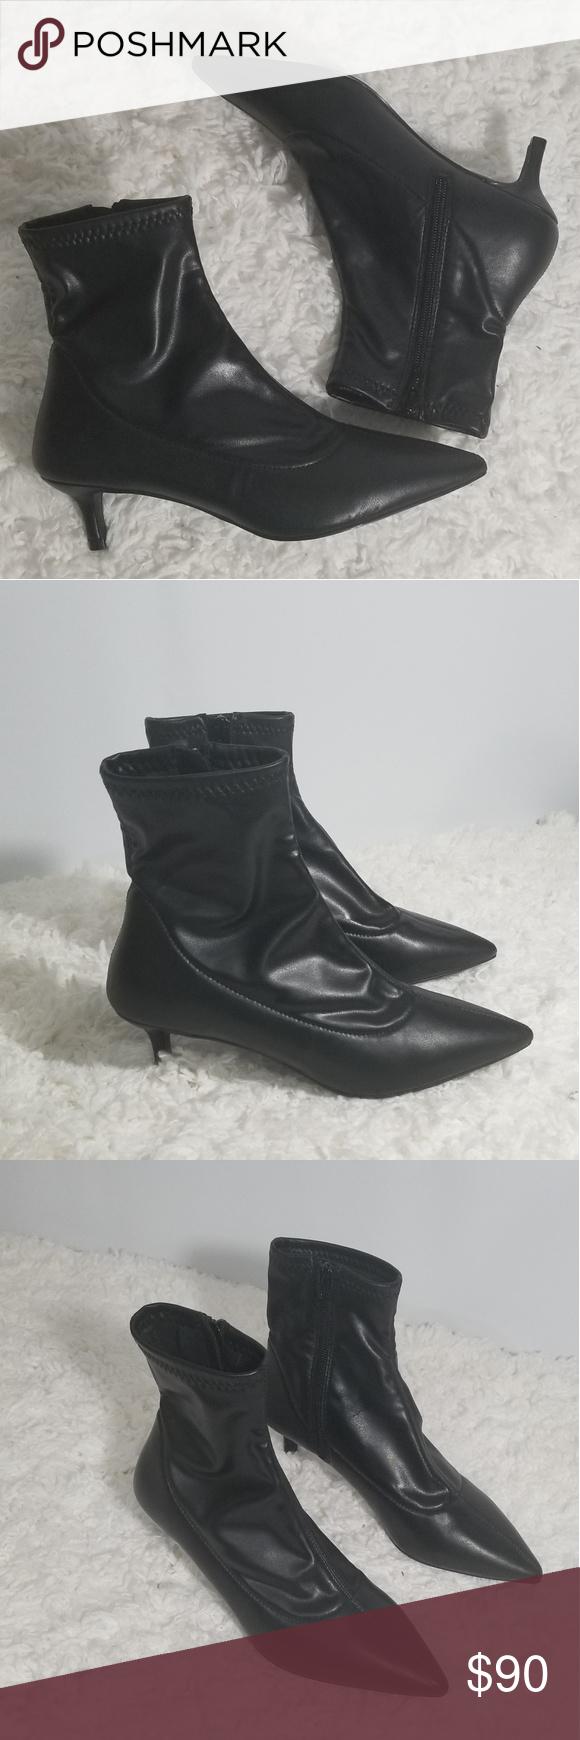 dce31aff694 Free People Marilyn Kitten Heel Black Size 36(us6) New without box Free  People Marilyn Kitten heel color black